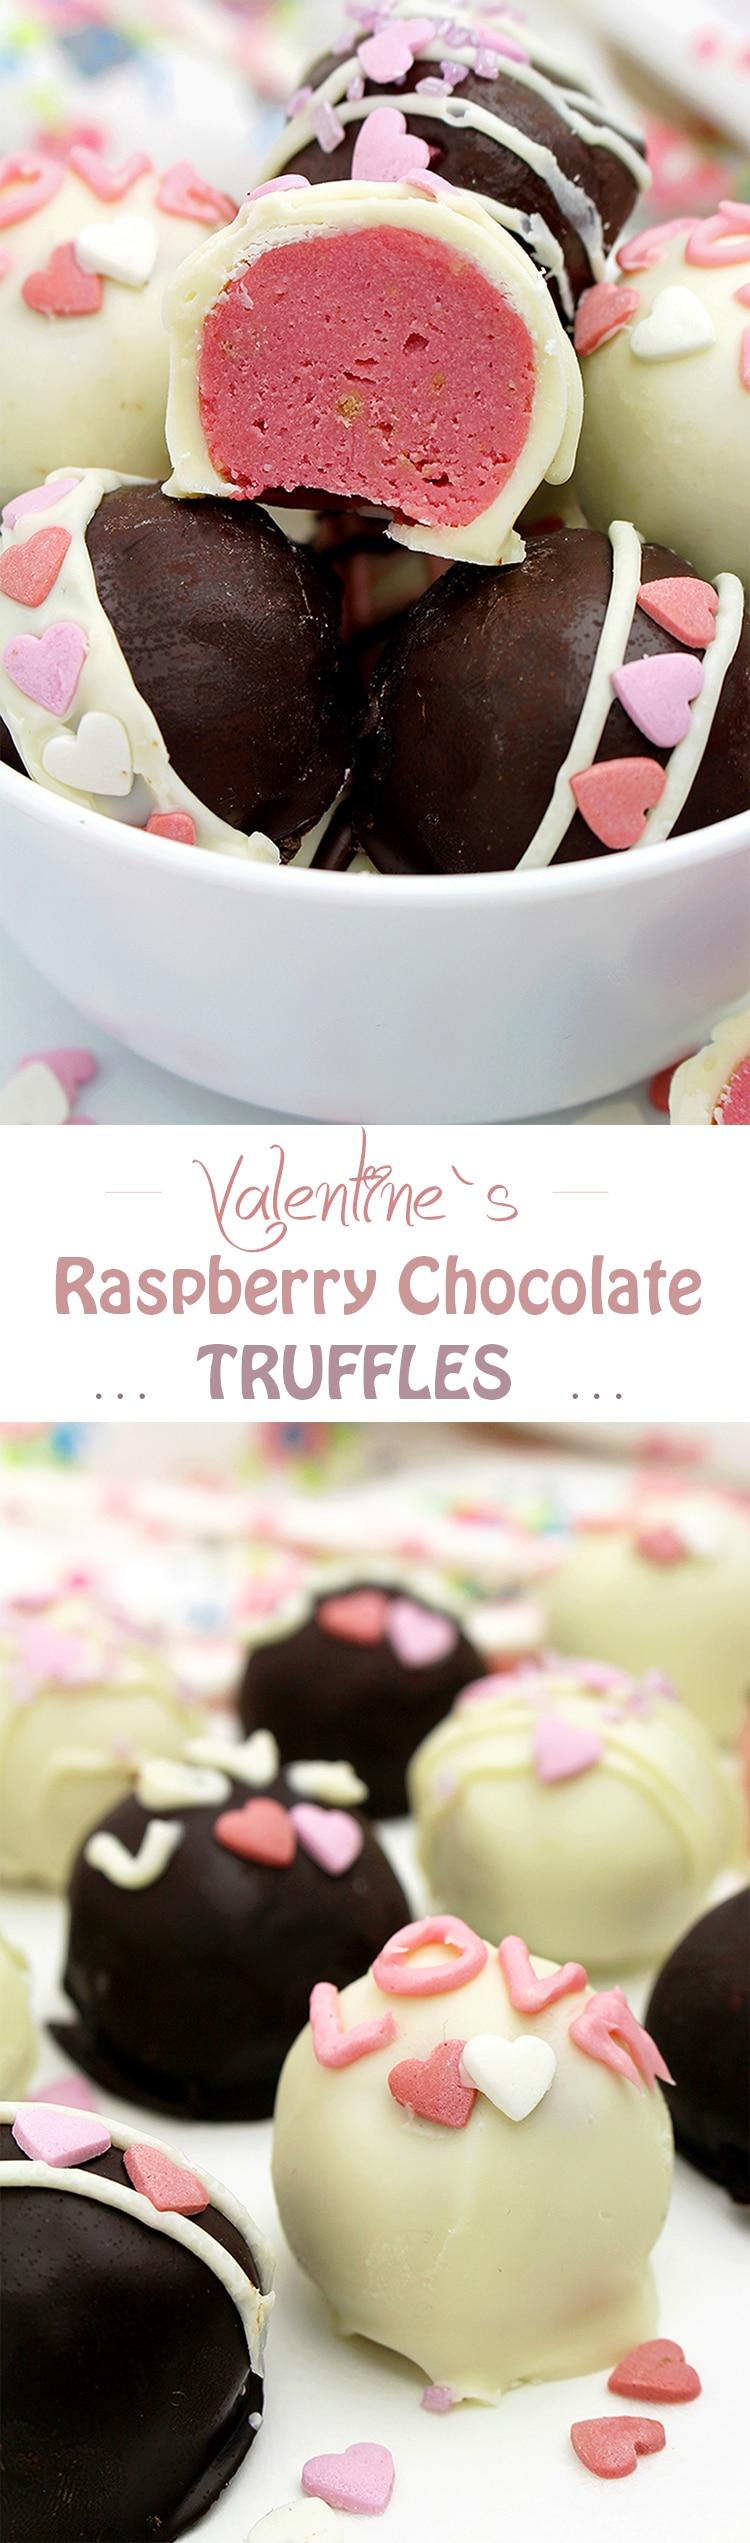 Valentine's Raspberry Chocolate Truffles